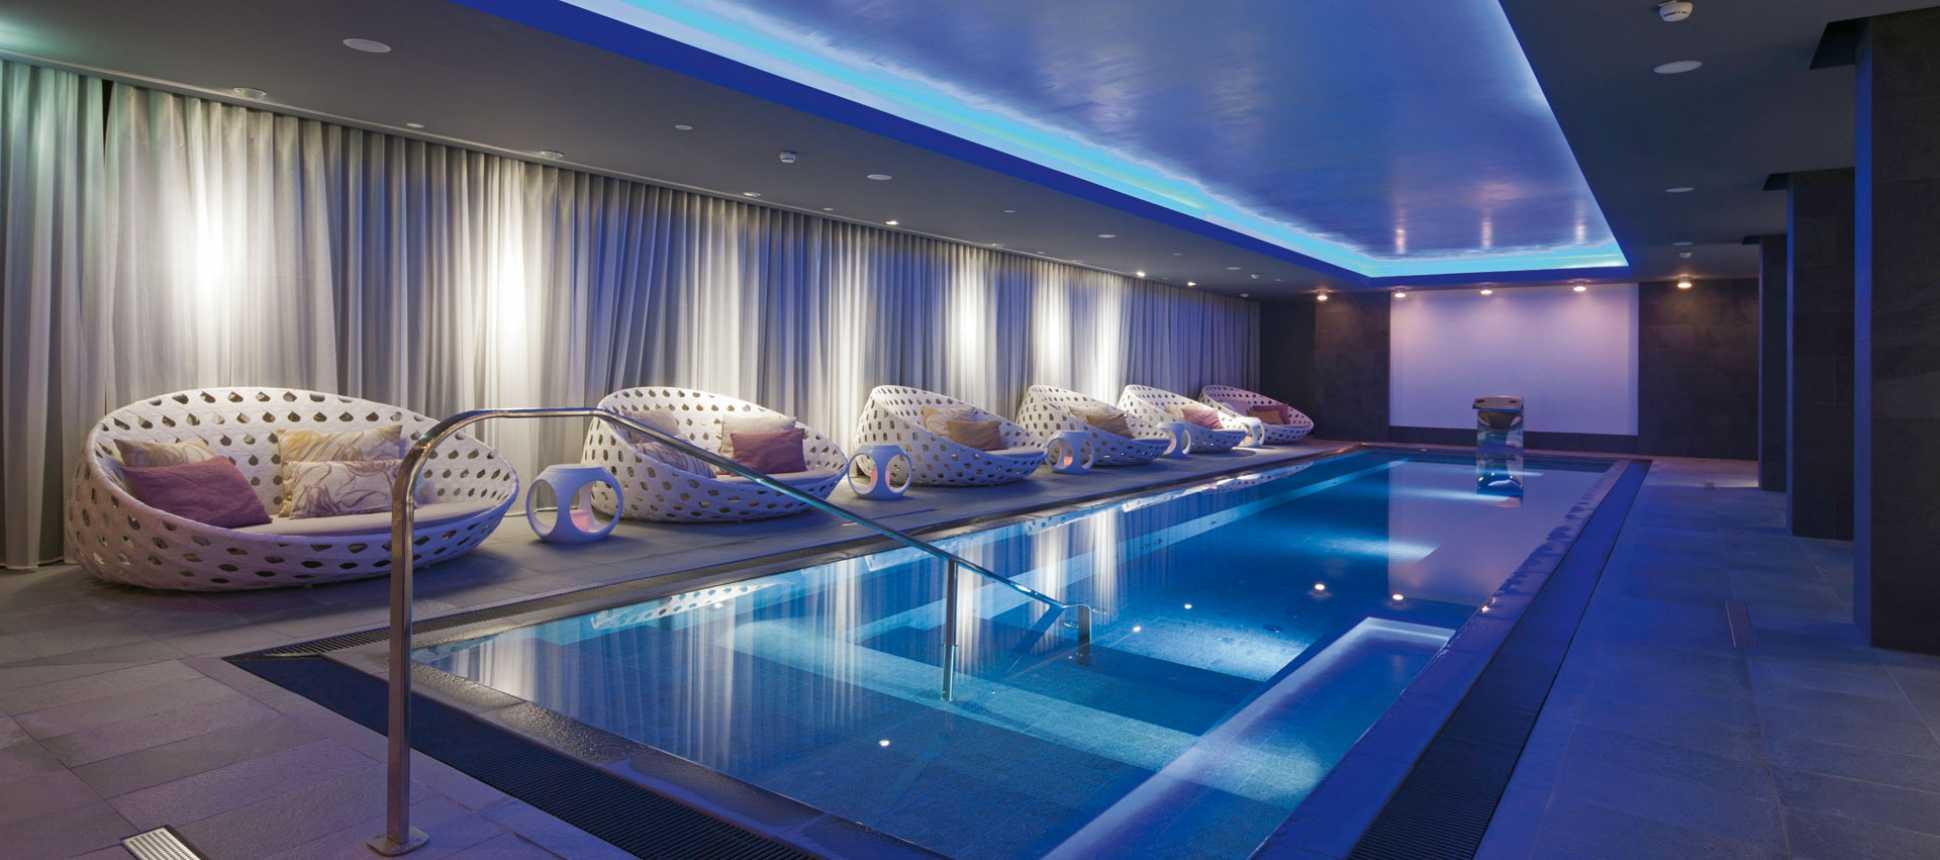 Swimmingpool Indoor Hallenbad